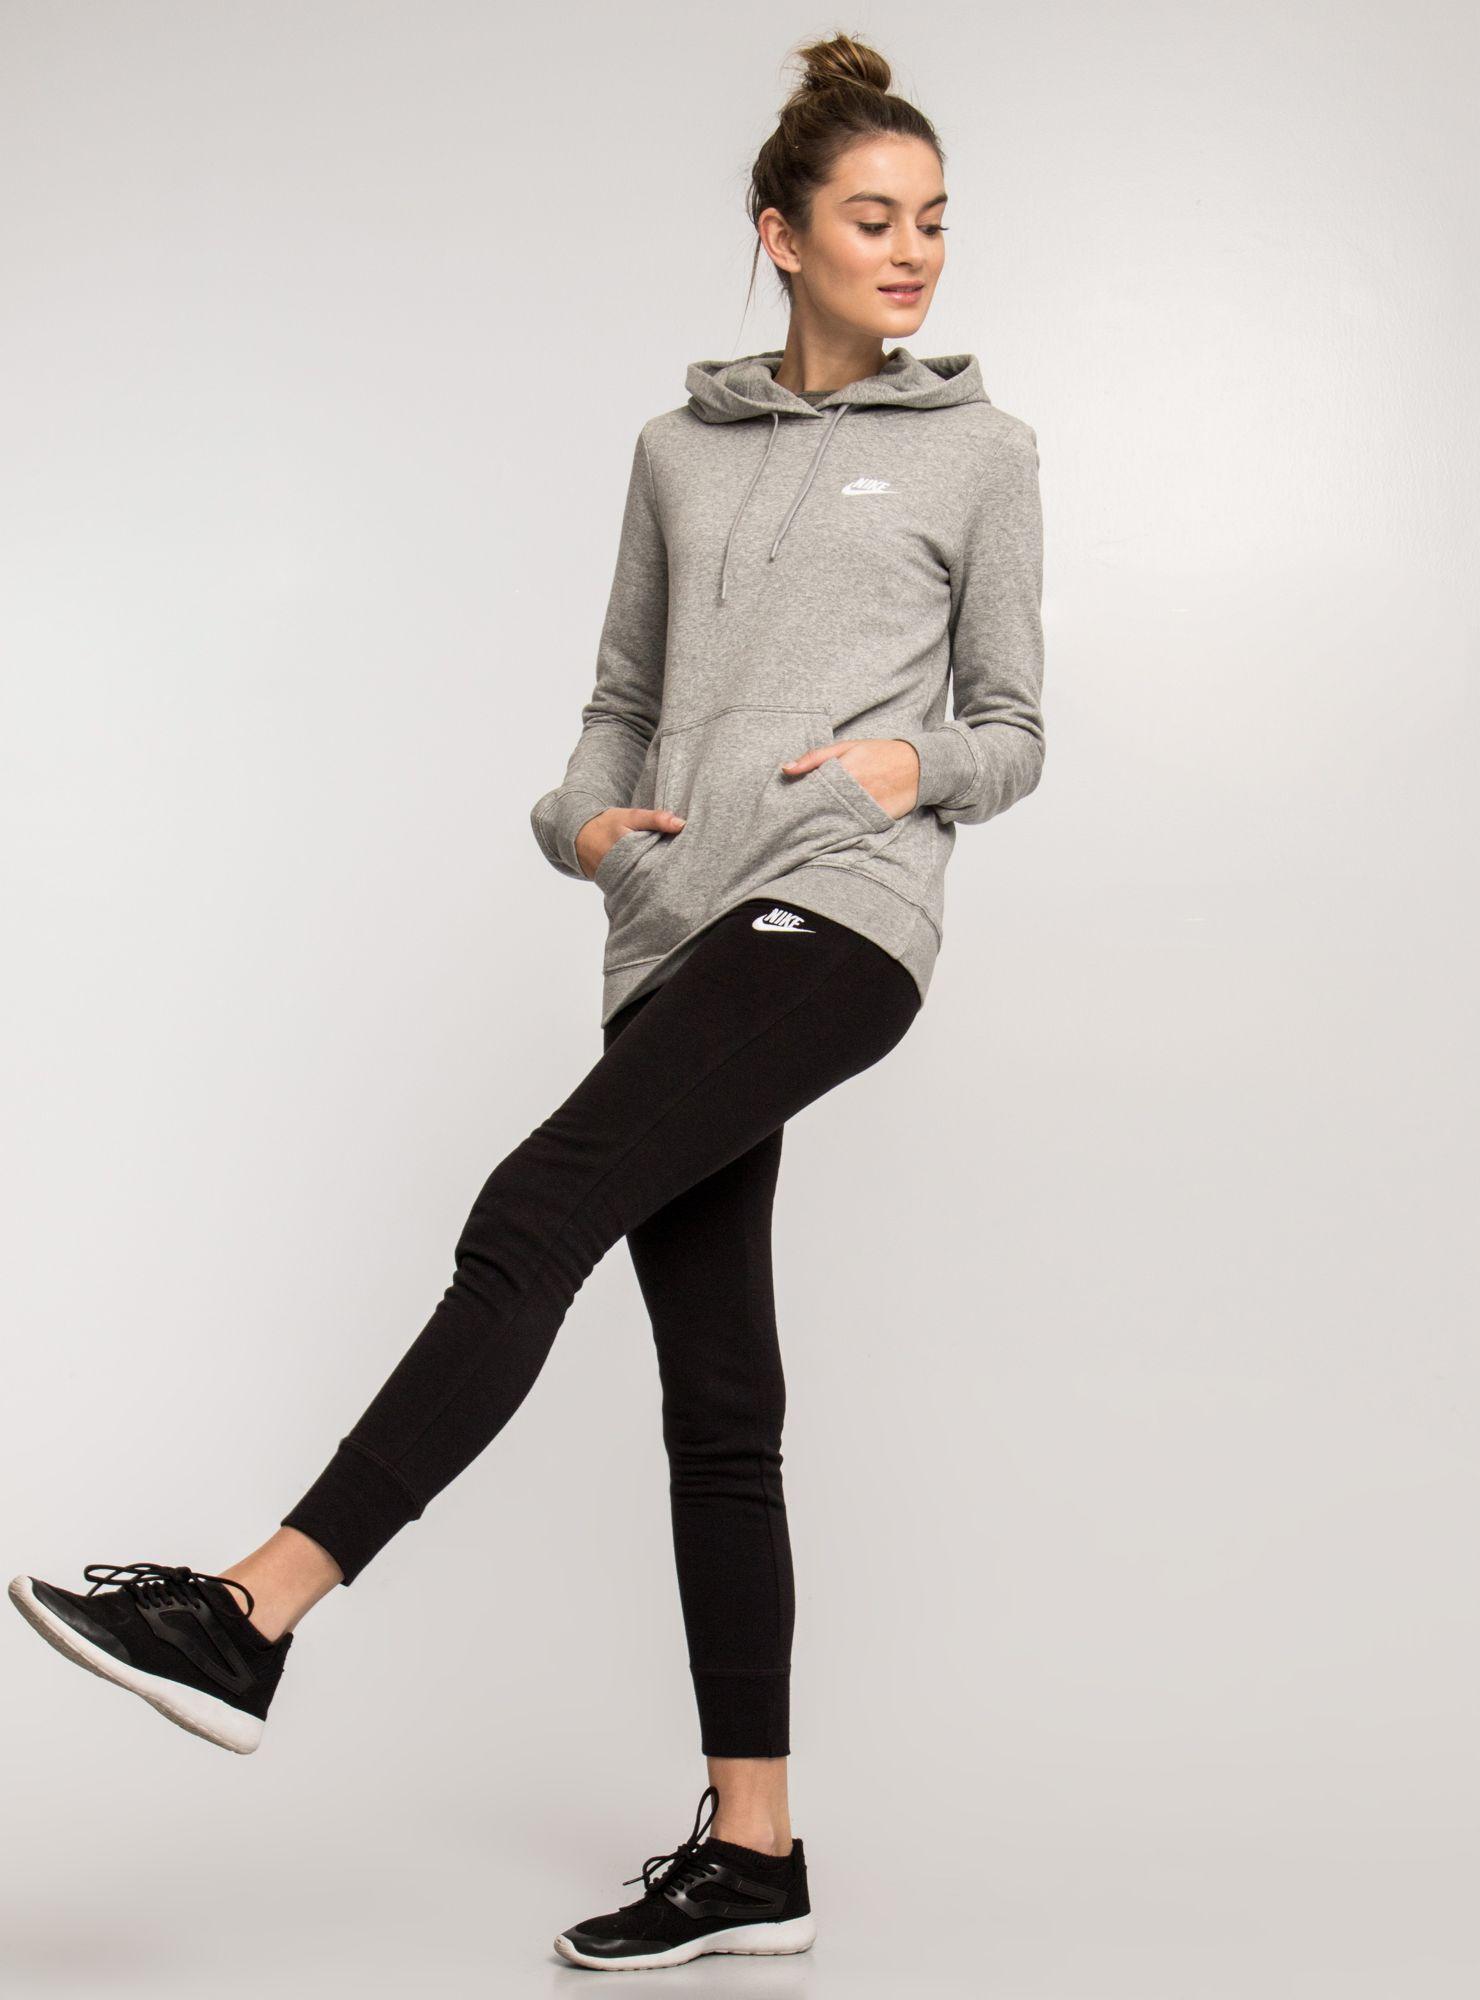 Pantalón Nike Fitness Mujer Flc Tight - Calzas y Pantalones  314b9e589e79